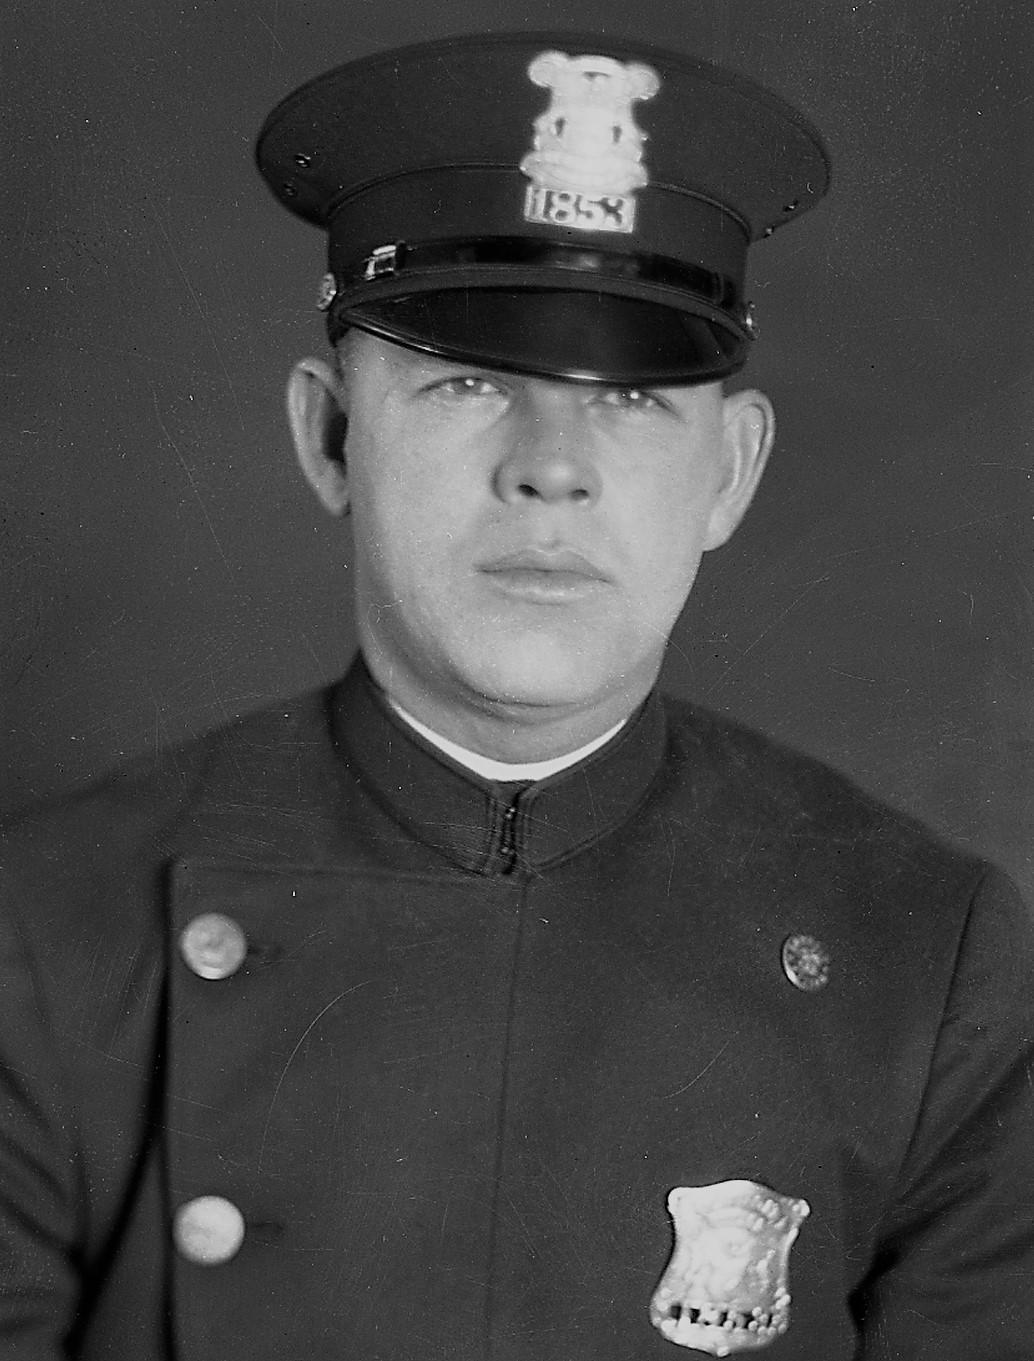 Police Officer Douglas W. Minton | Detroit Police Department, Michigan